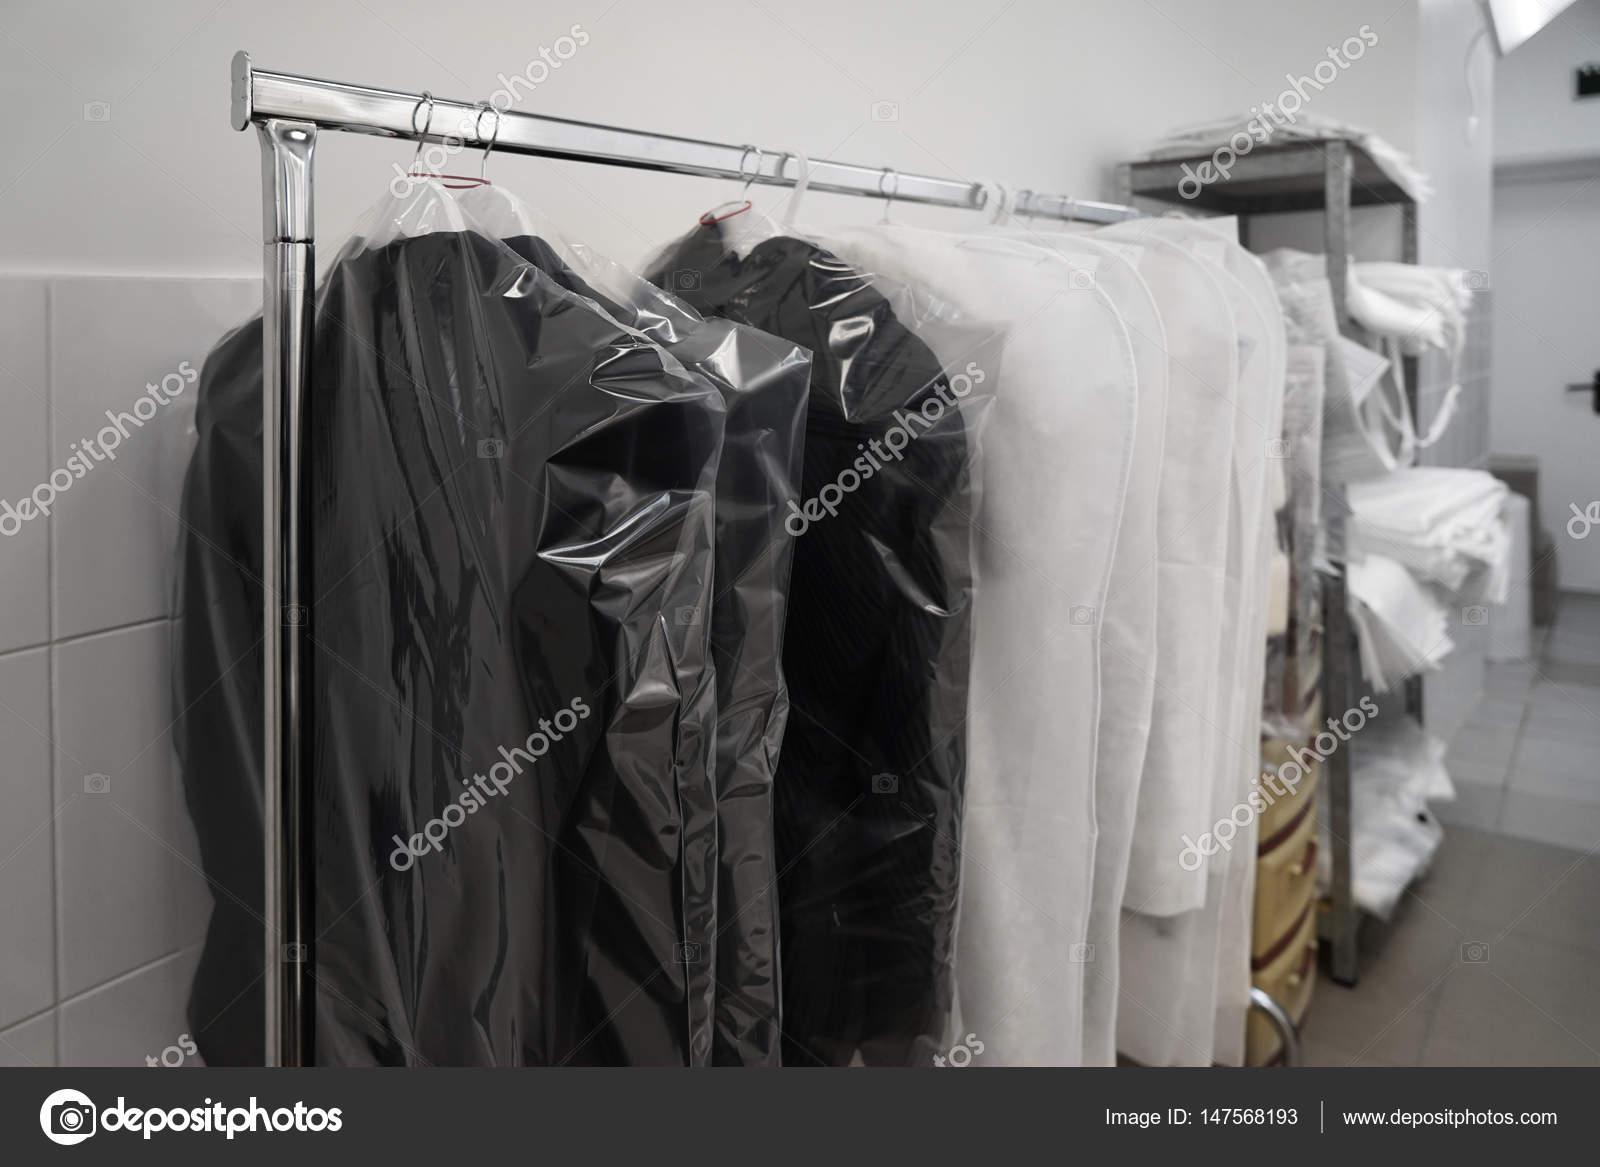 5d24448913 Καθαρά συσκευασμένα ρούχα που κρέμονται στο εργαστήρι ΚΑΘΑΡΙΣΤΗΡΙΑ– εικόνα  αρχείου